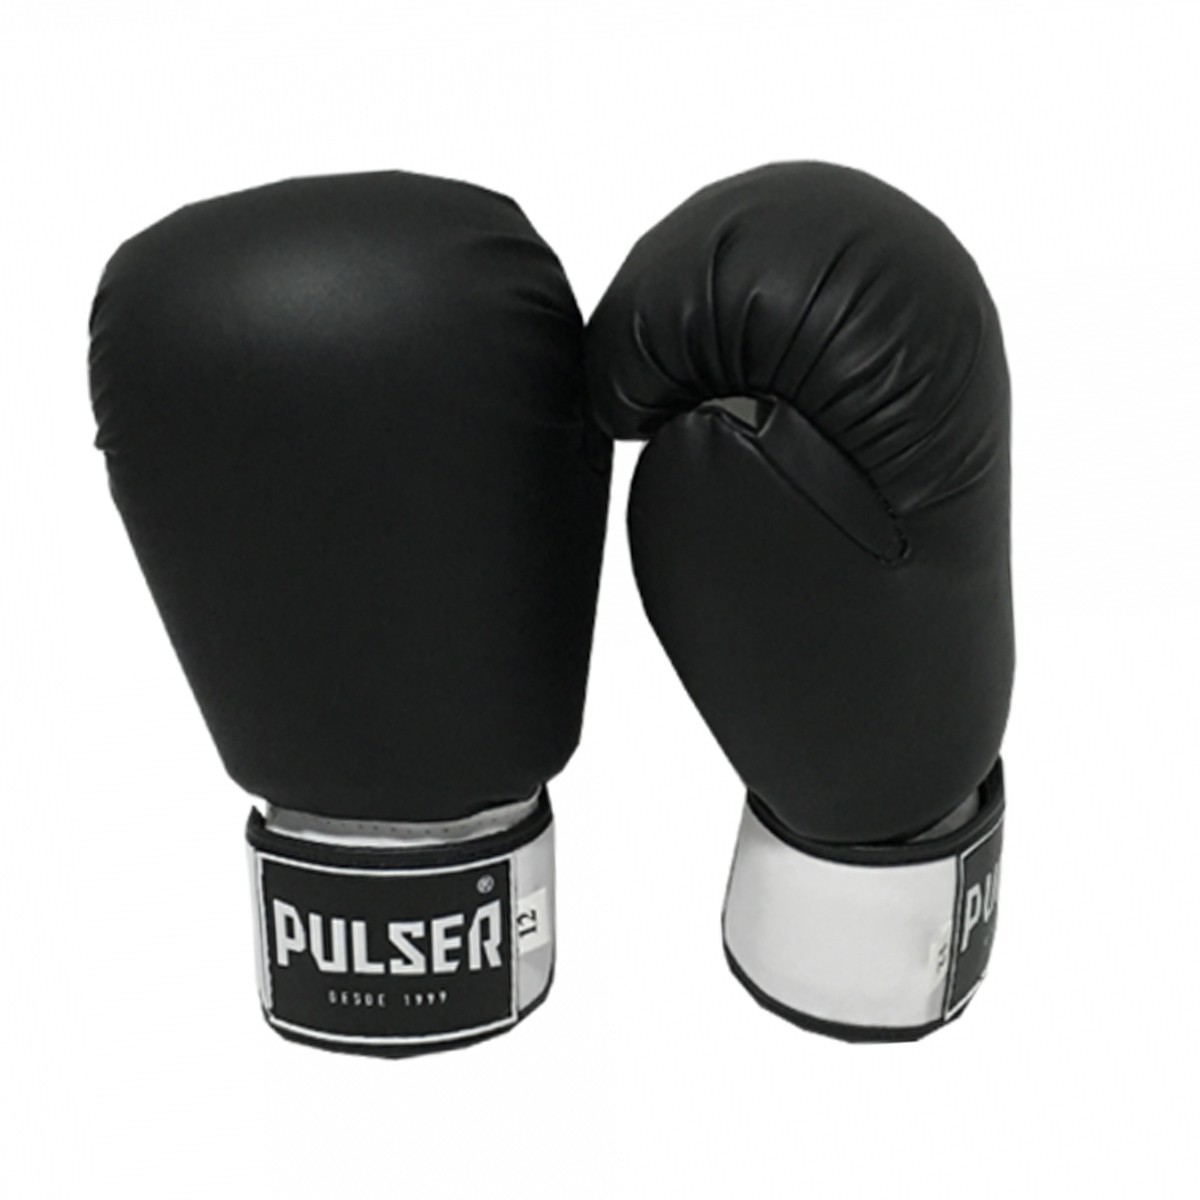 Kit de Muay Thai / Kickboxing 16oz - Preto - Pulser  - PRALUTA SHOP